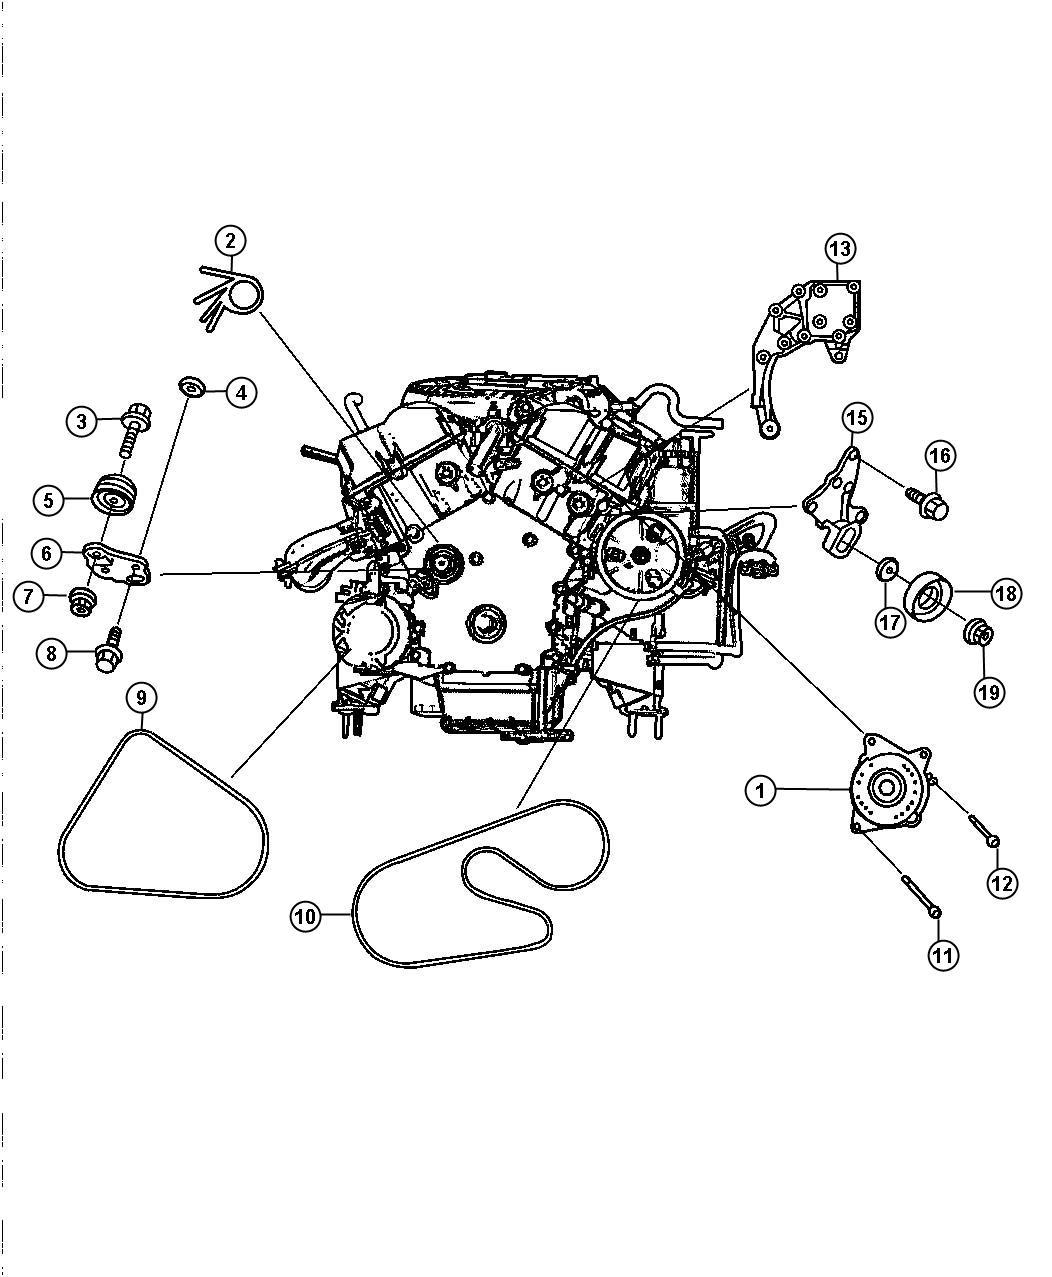 Dodge Intrepid Belt Used For Alt And Power Steering